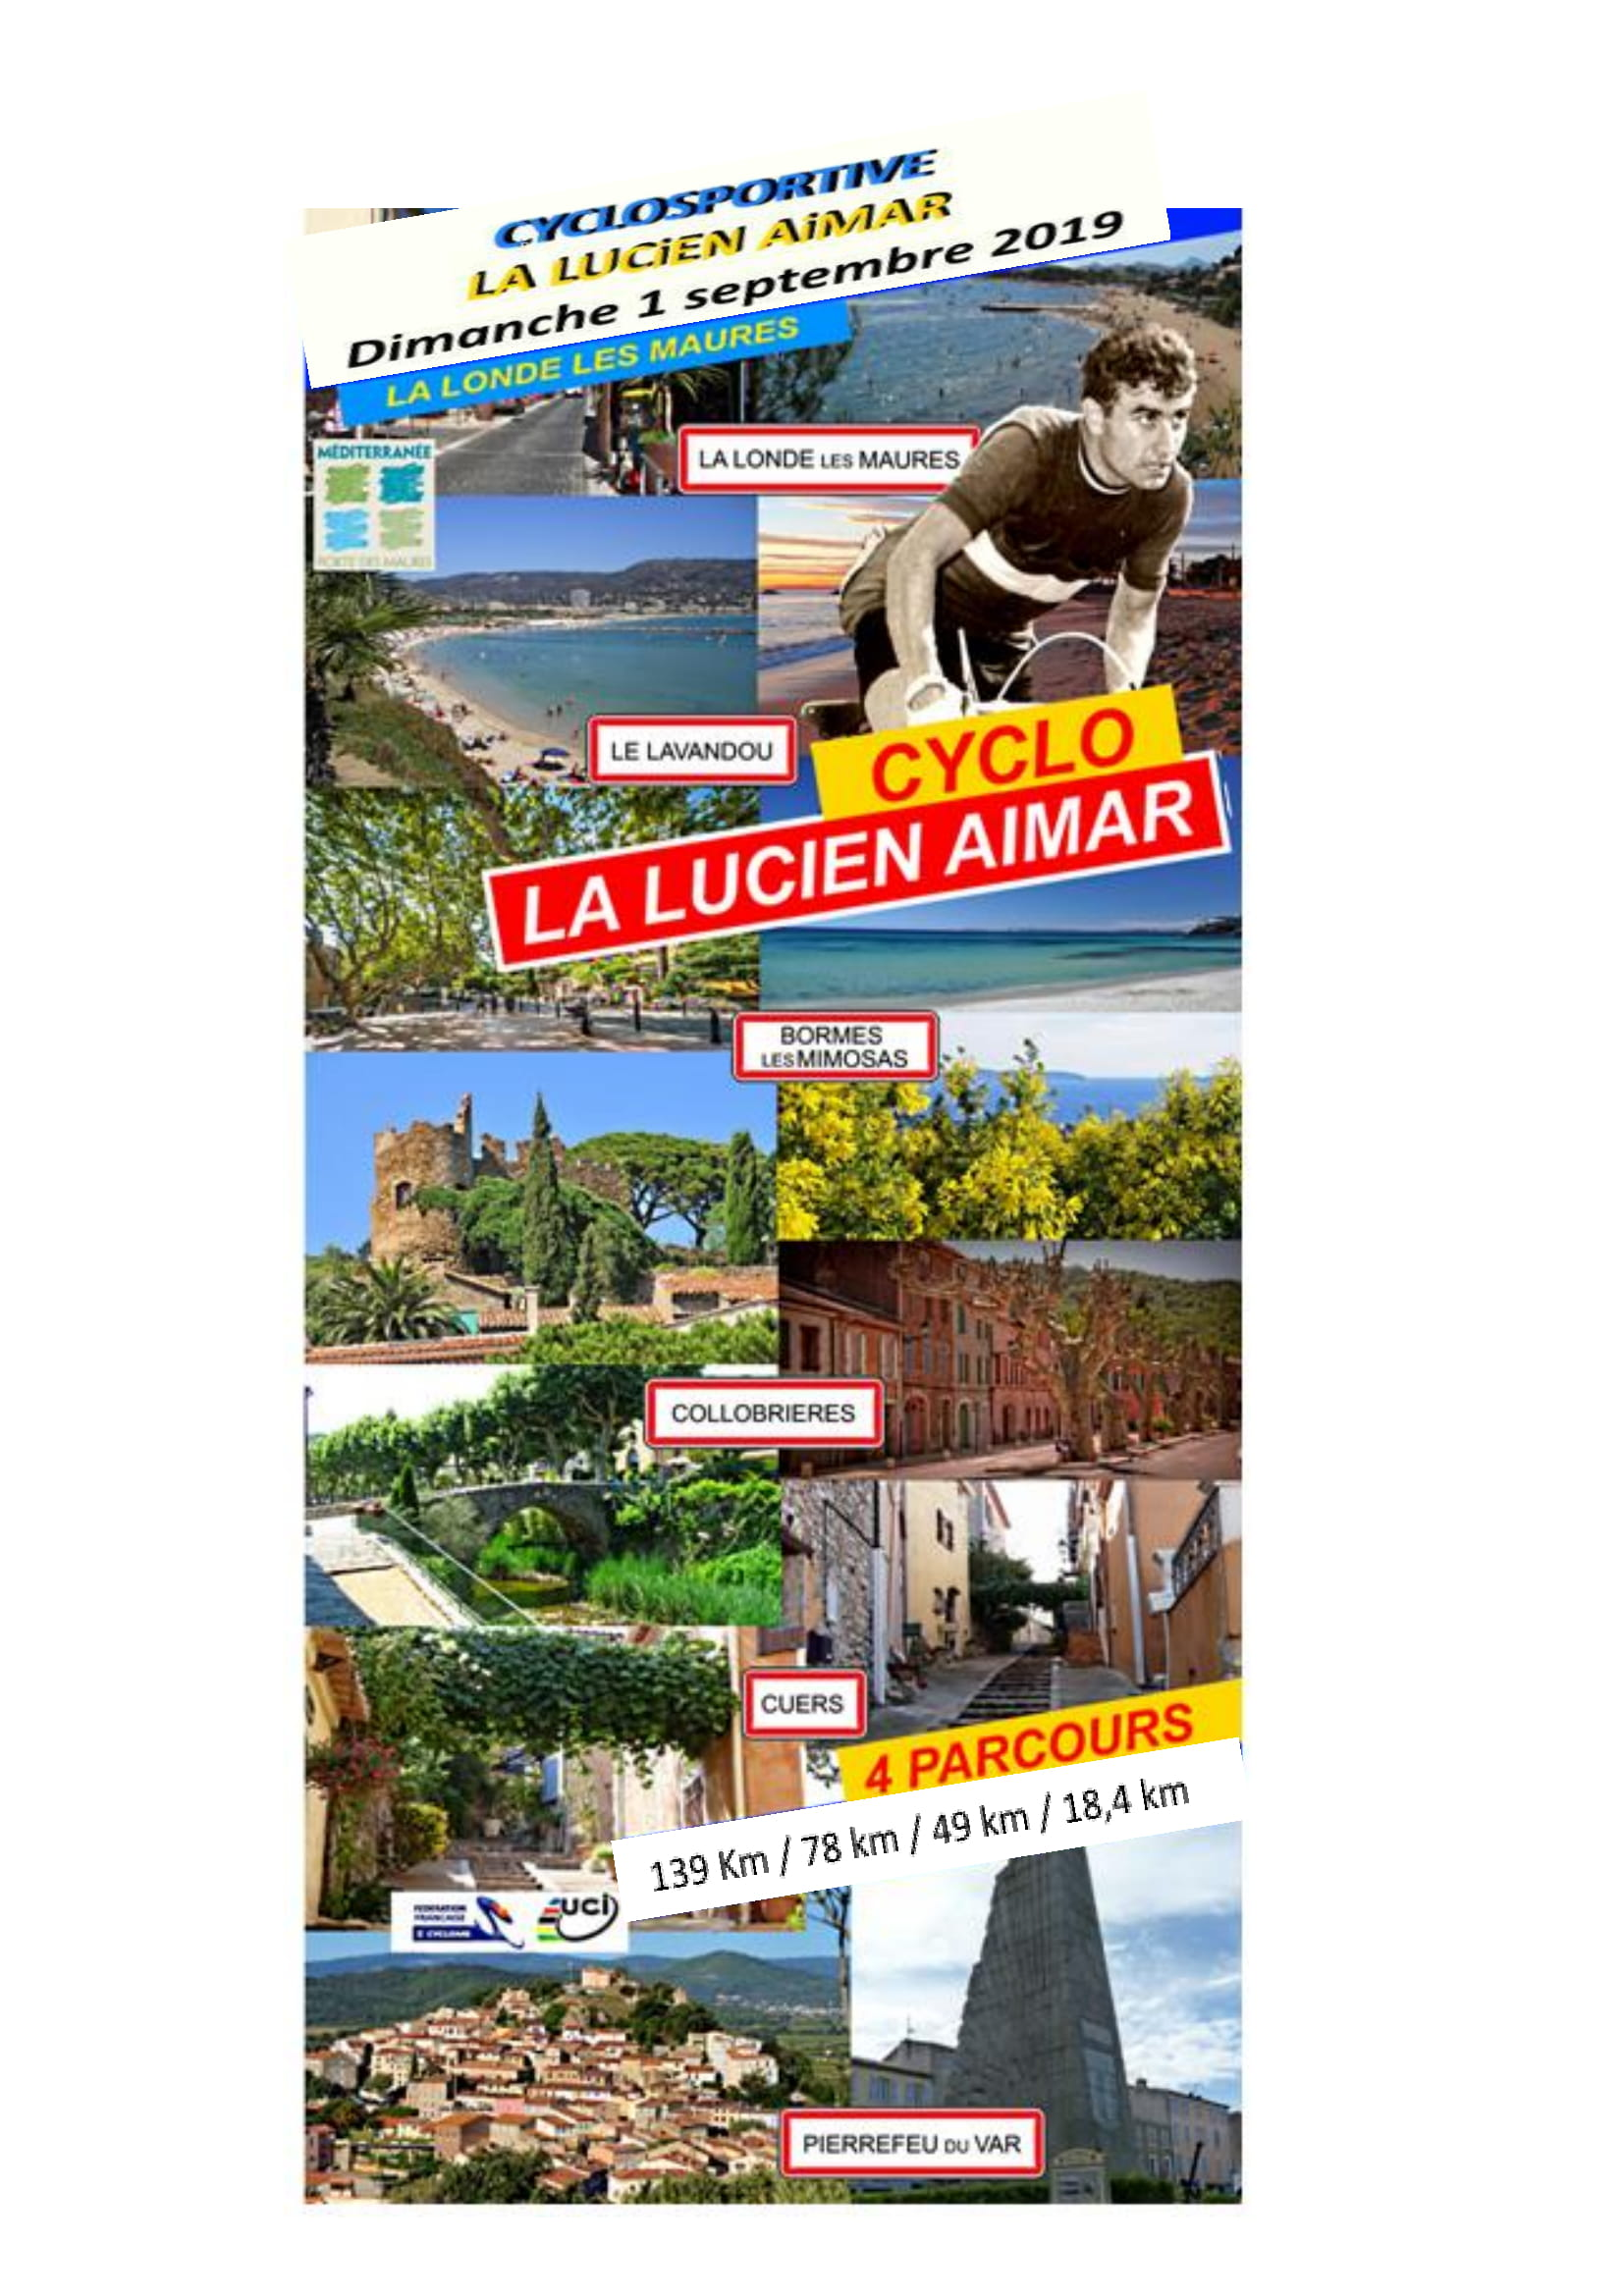 La Lucien Aimar - 18.4km Duo